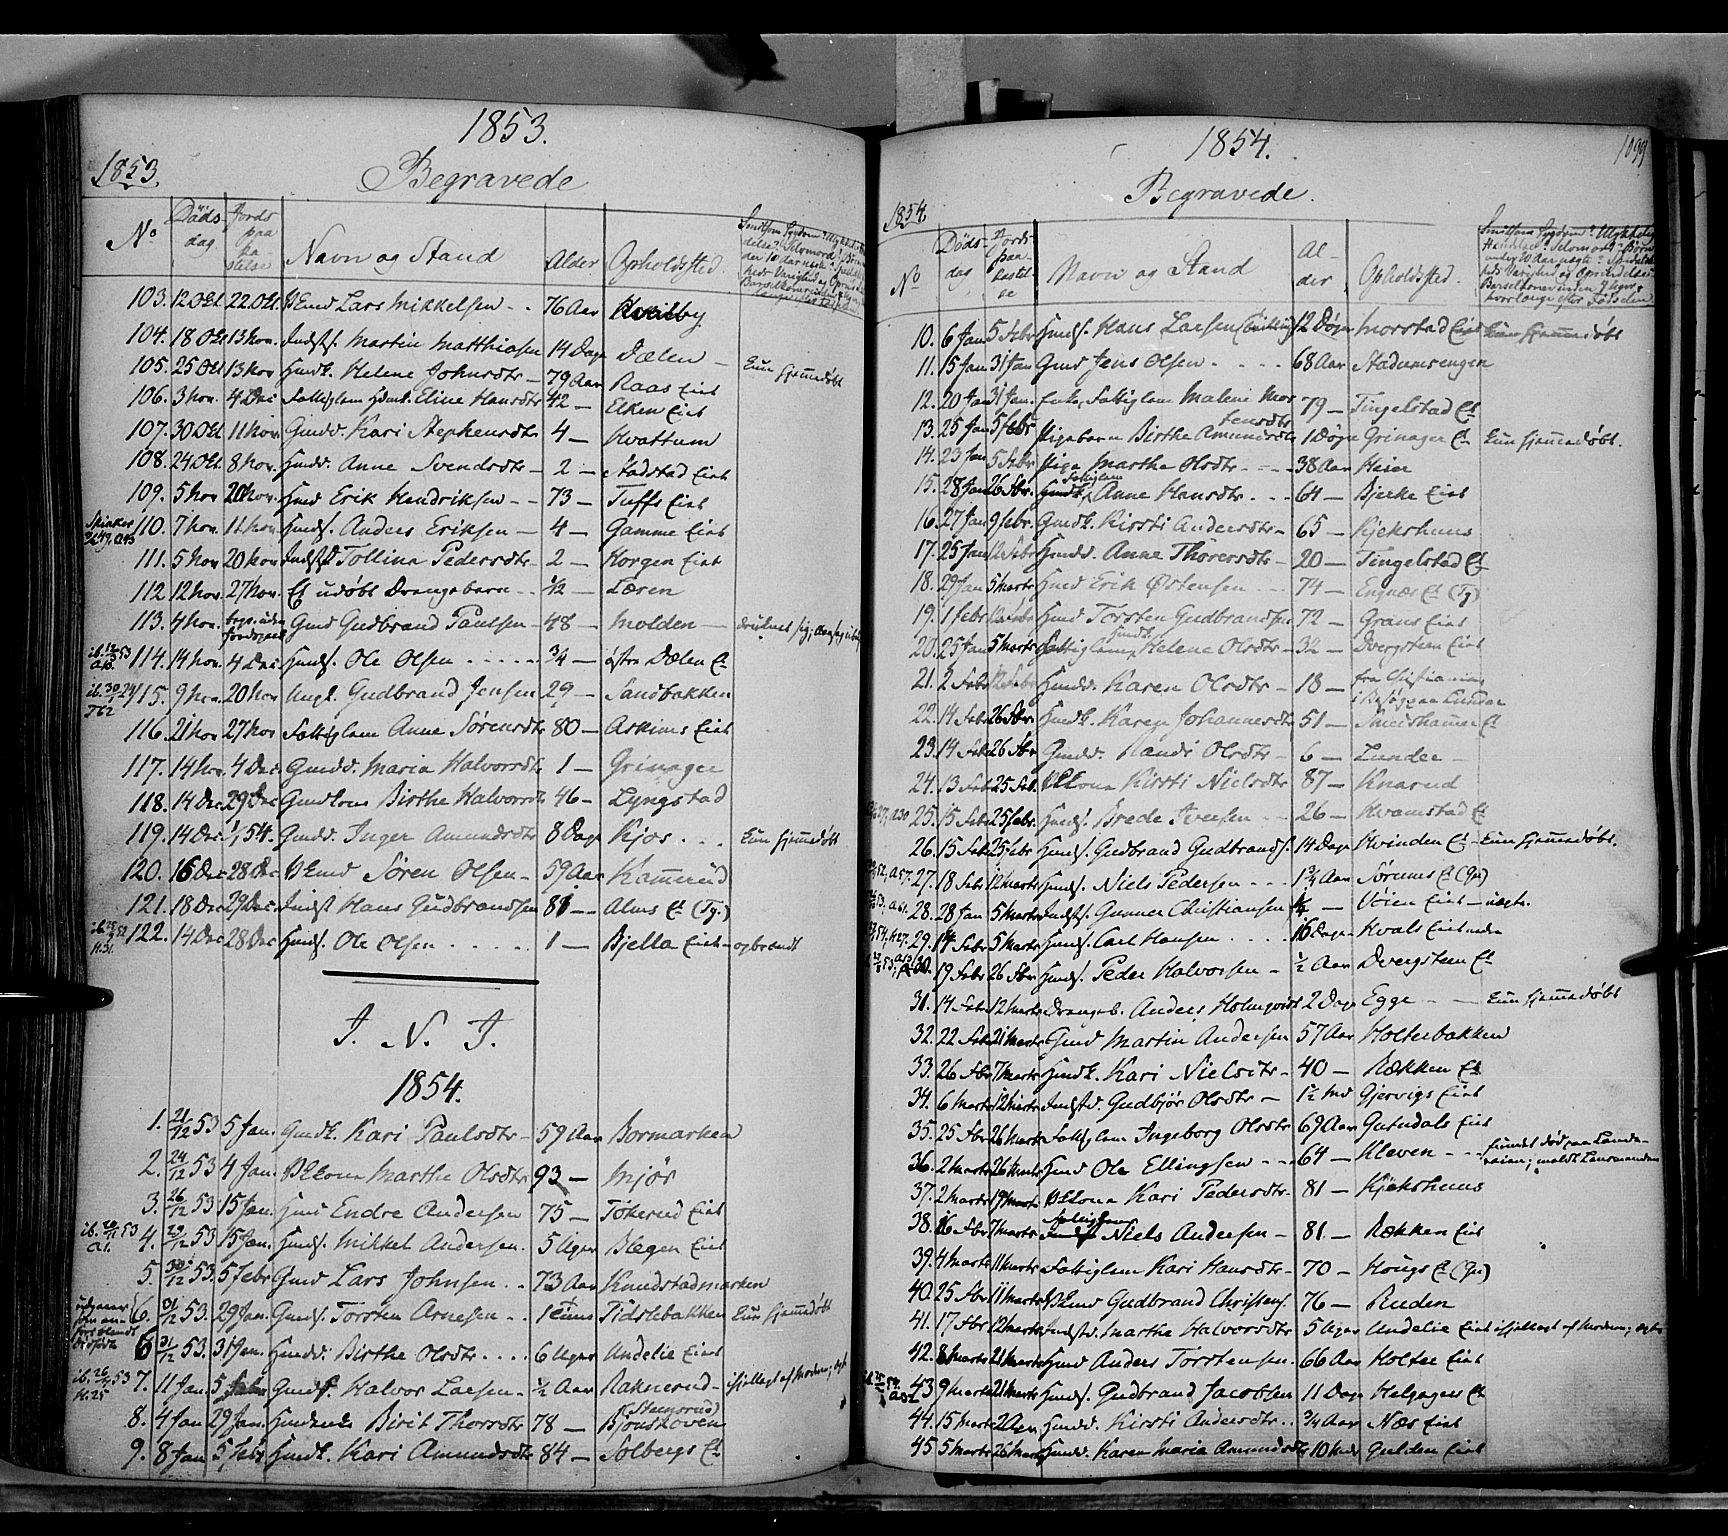 SAH, Gran prestekontor, Ministerialbok nr. 11, 1842-1856, s. 1098-1099